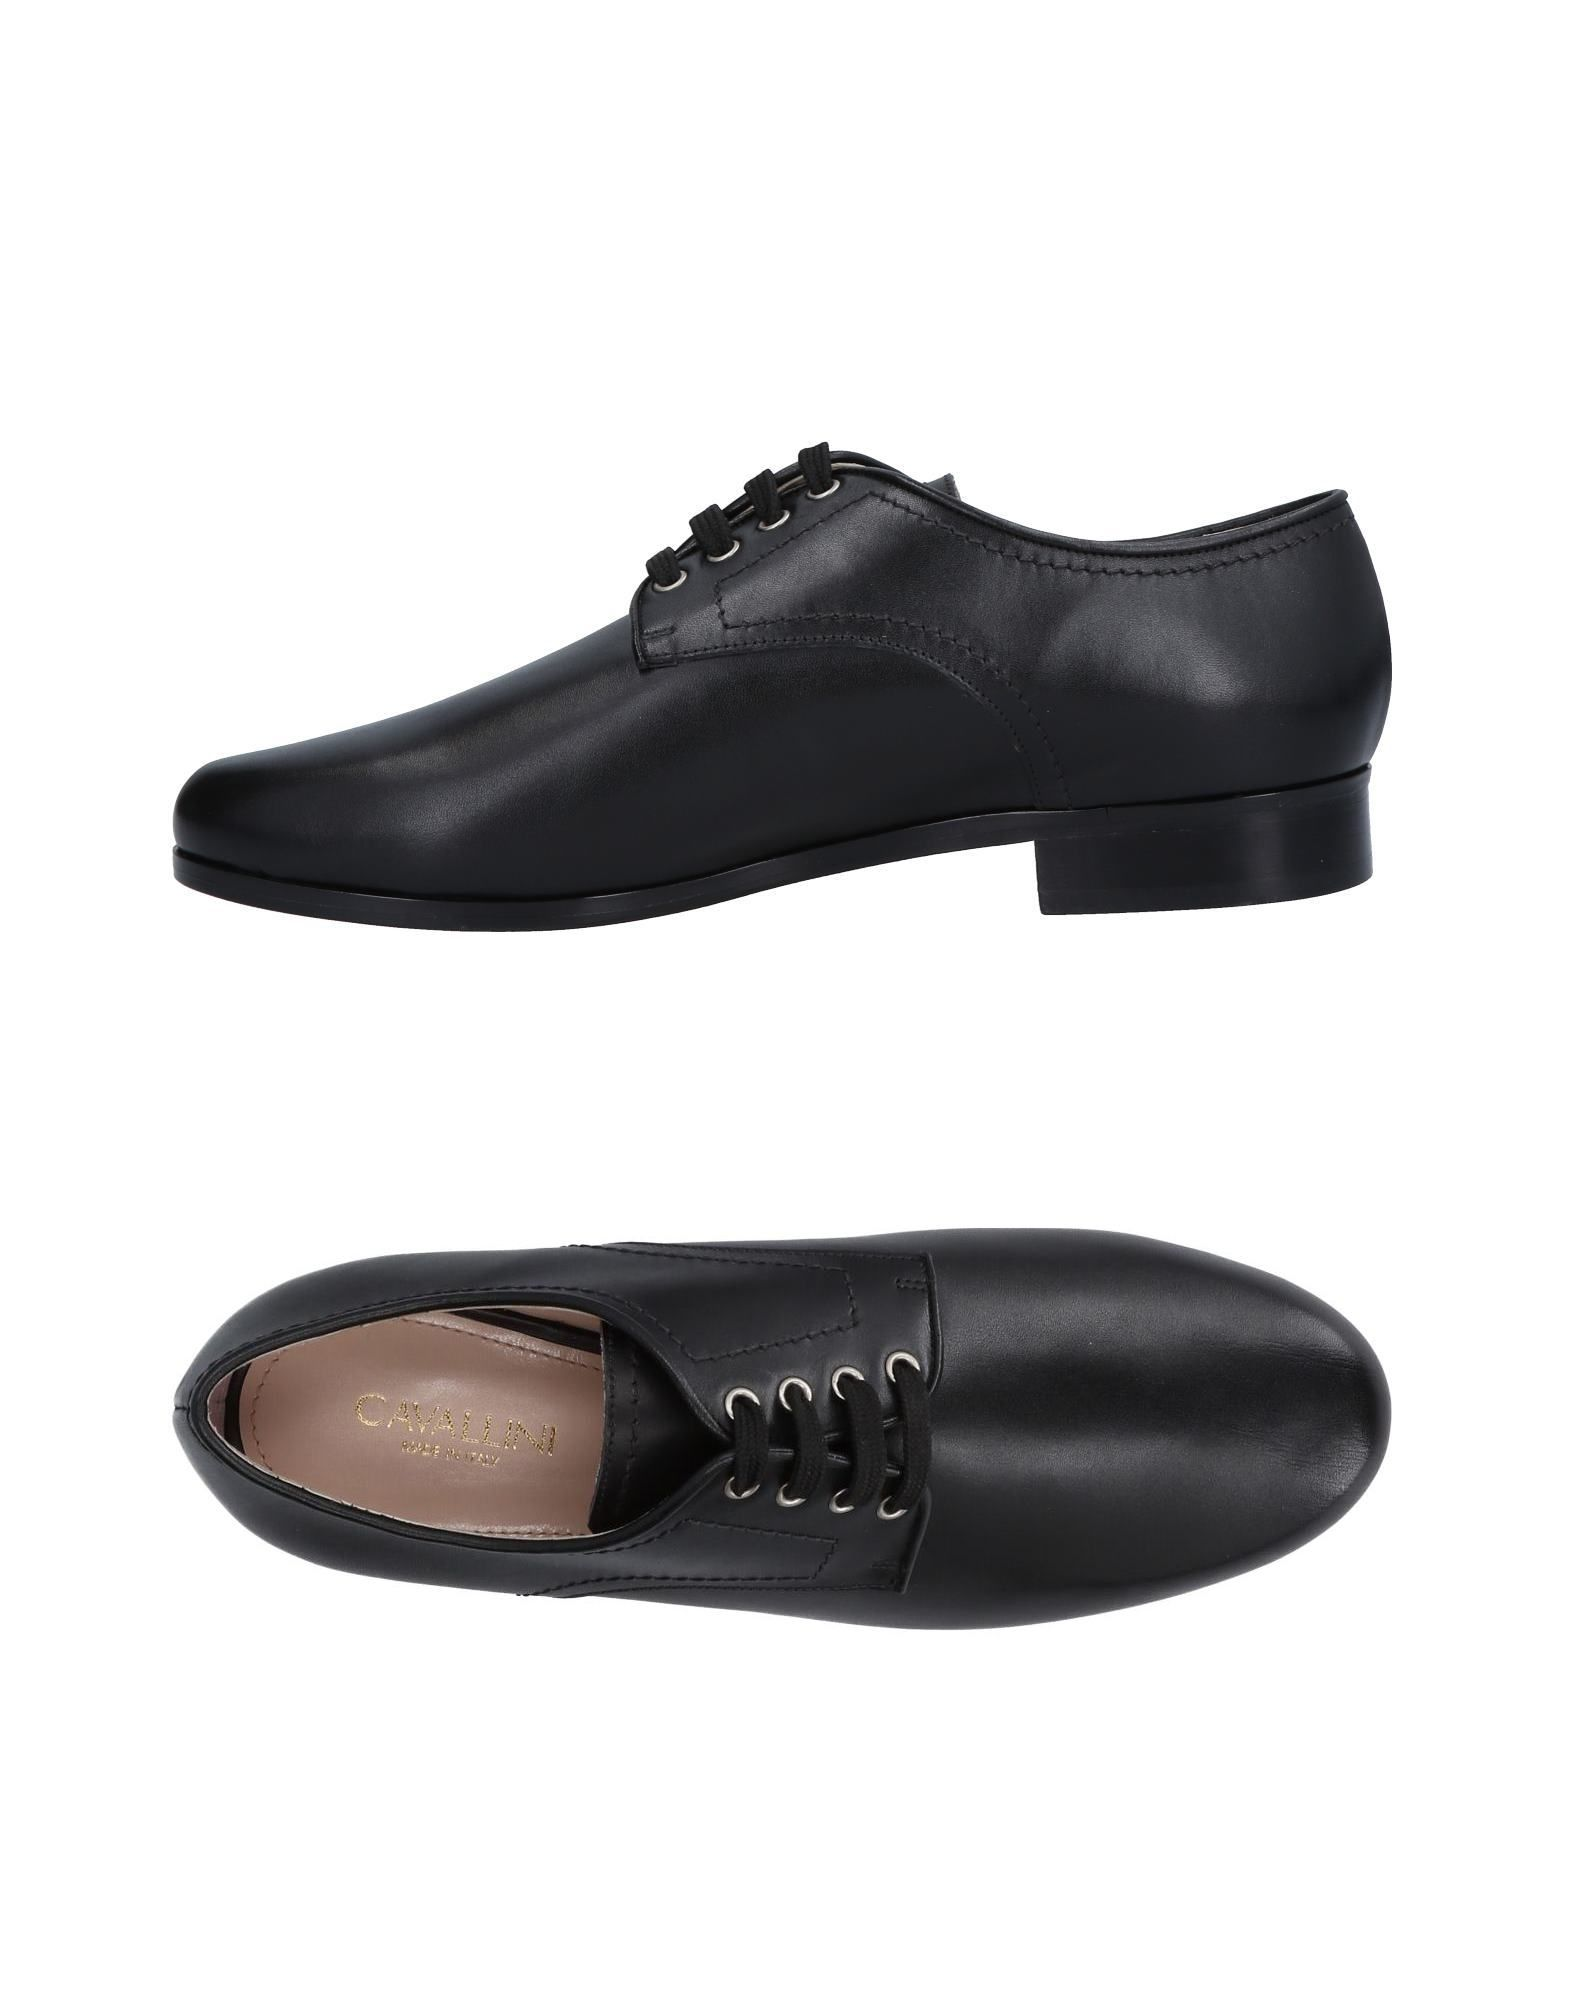 Фото - CAVALLINI Обувь на шнурках обувь на высокой платформе dkny